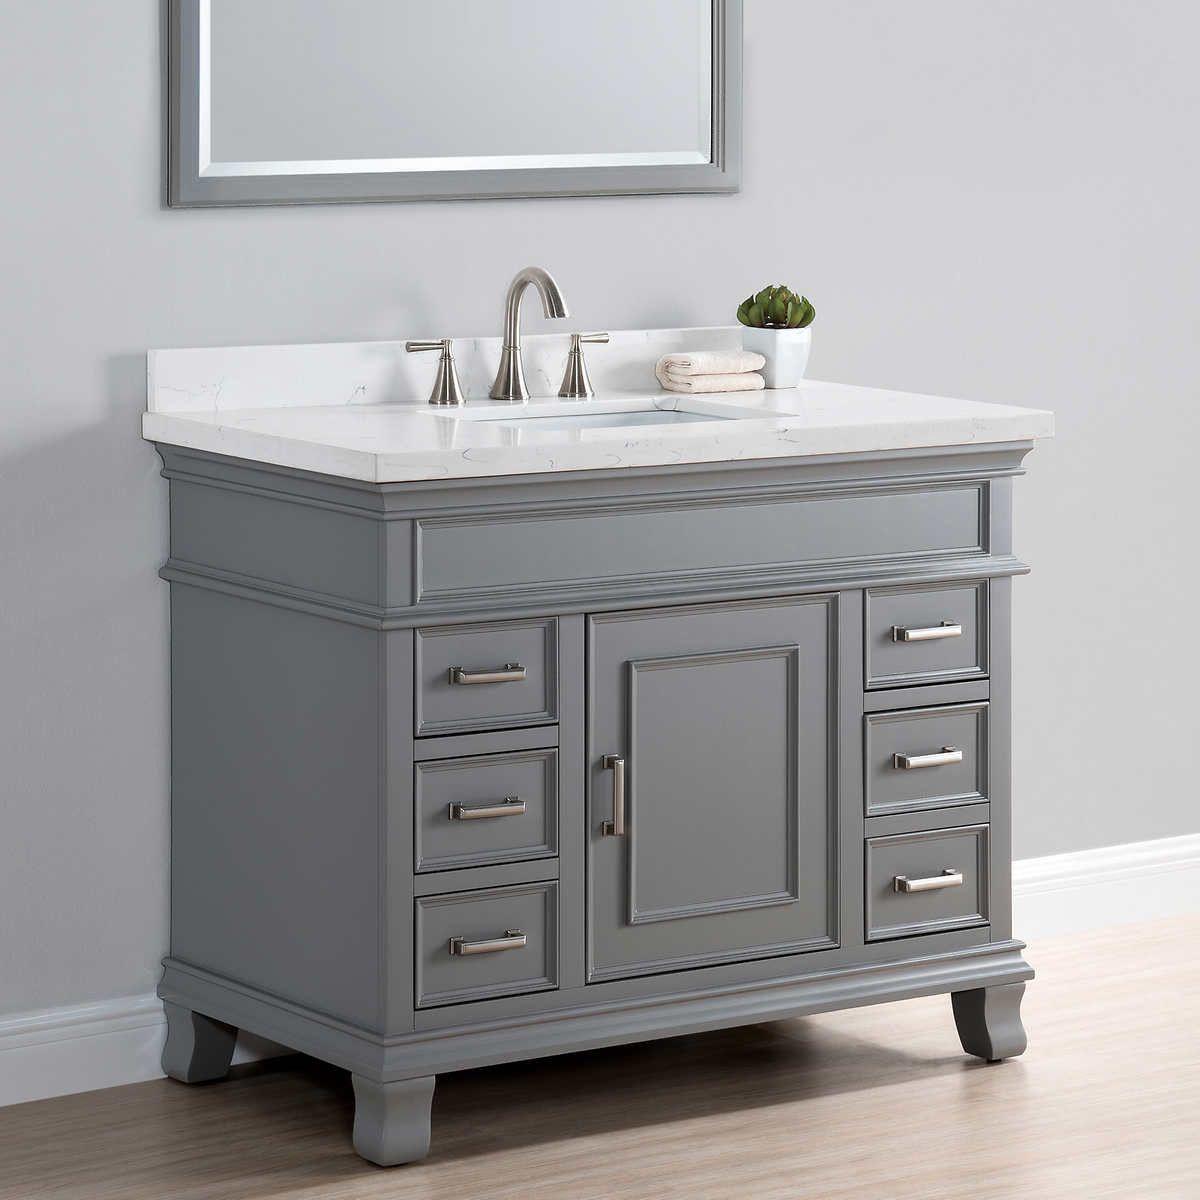 in bathroom vanity cabinet favorite interior paint colors